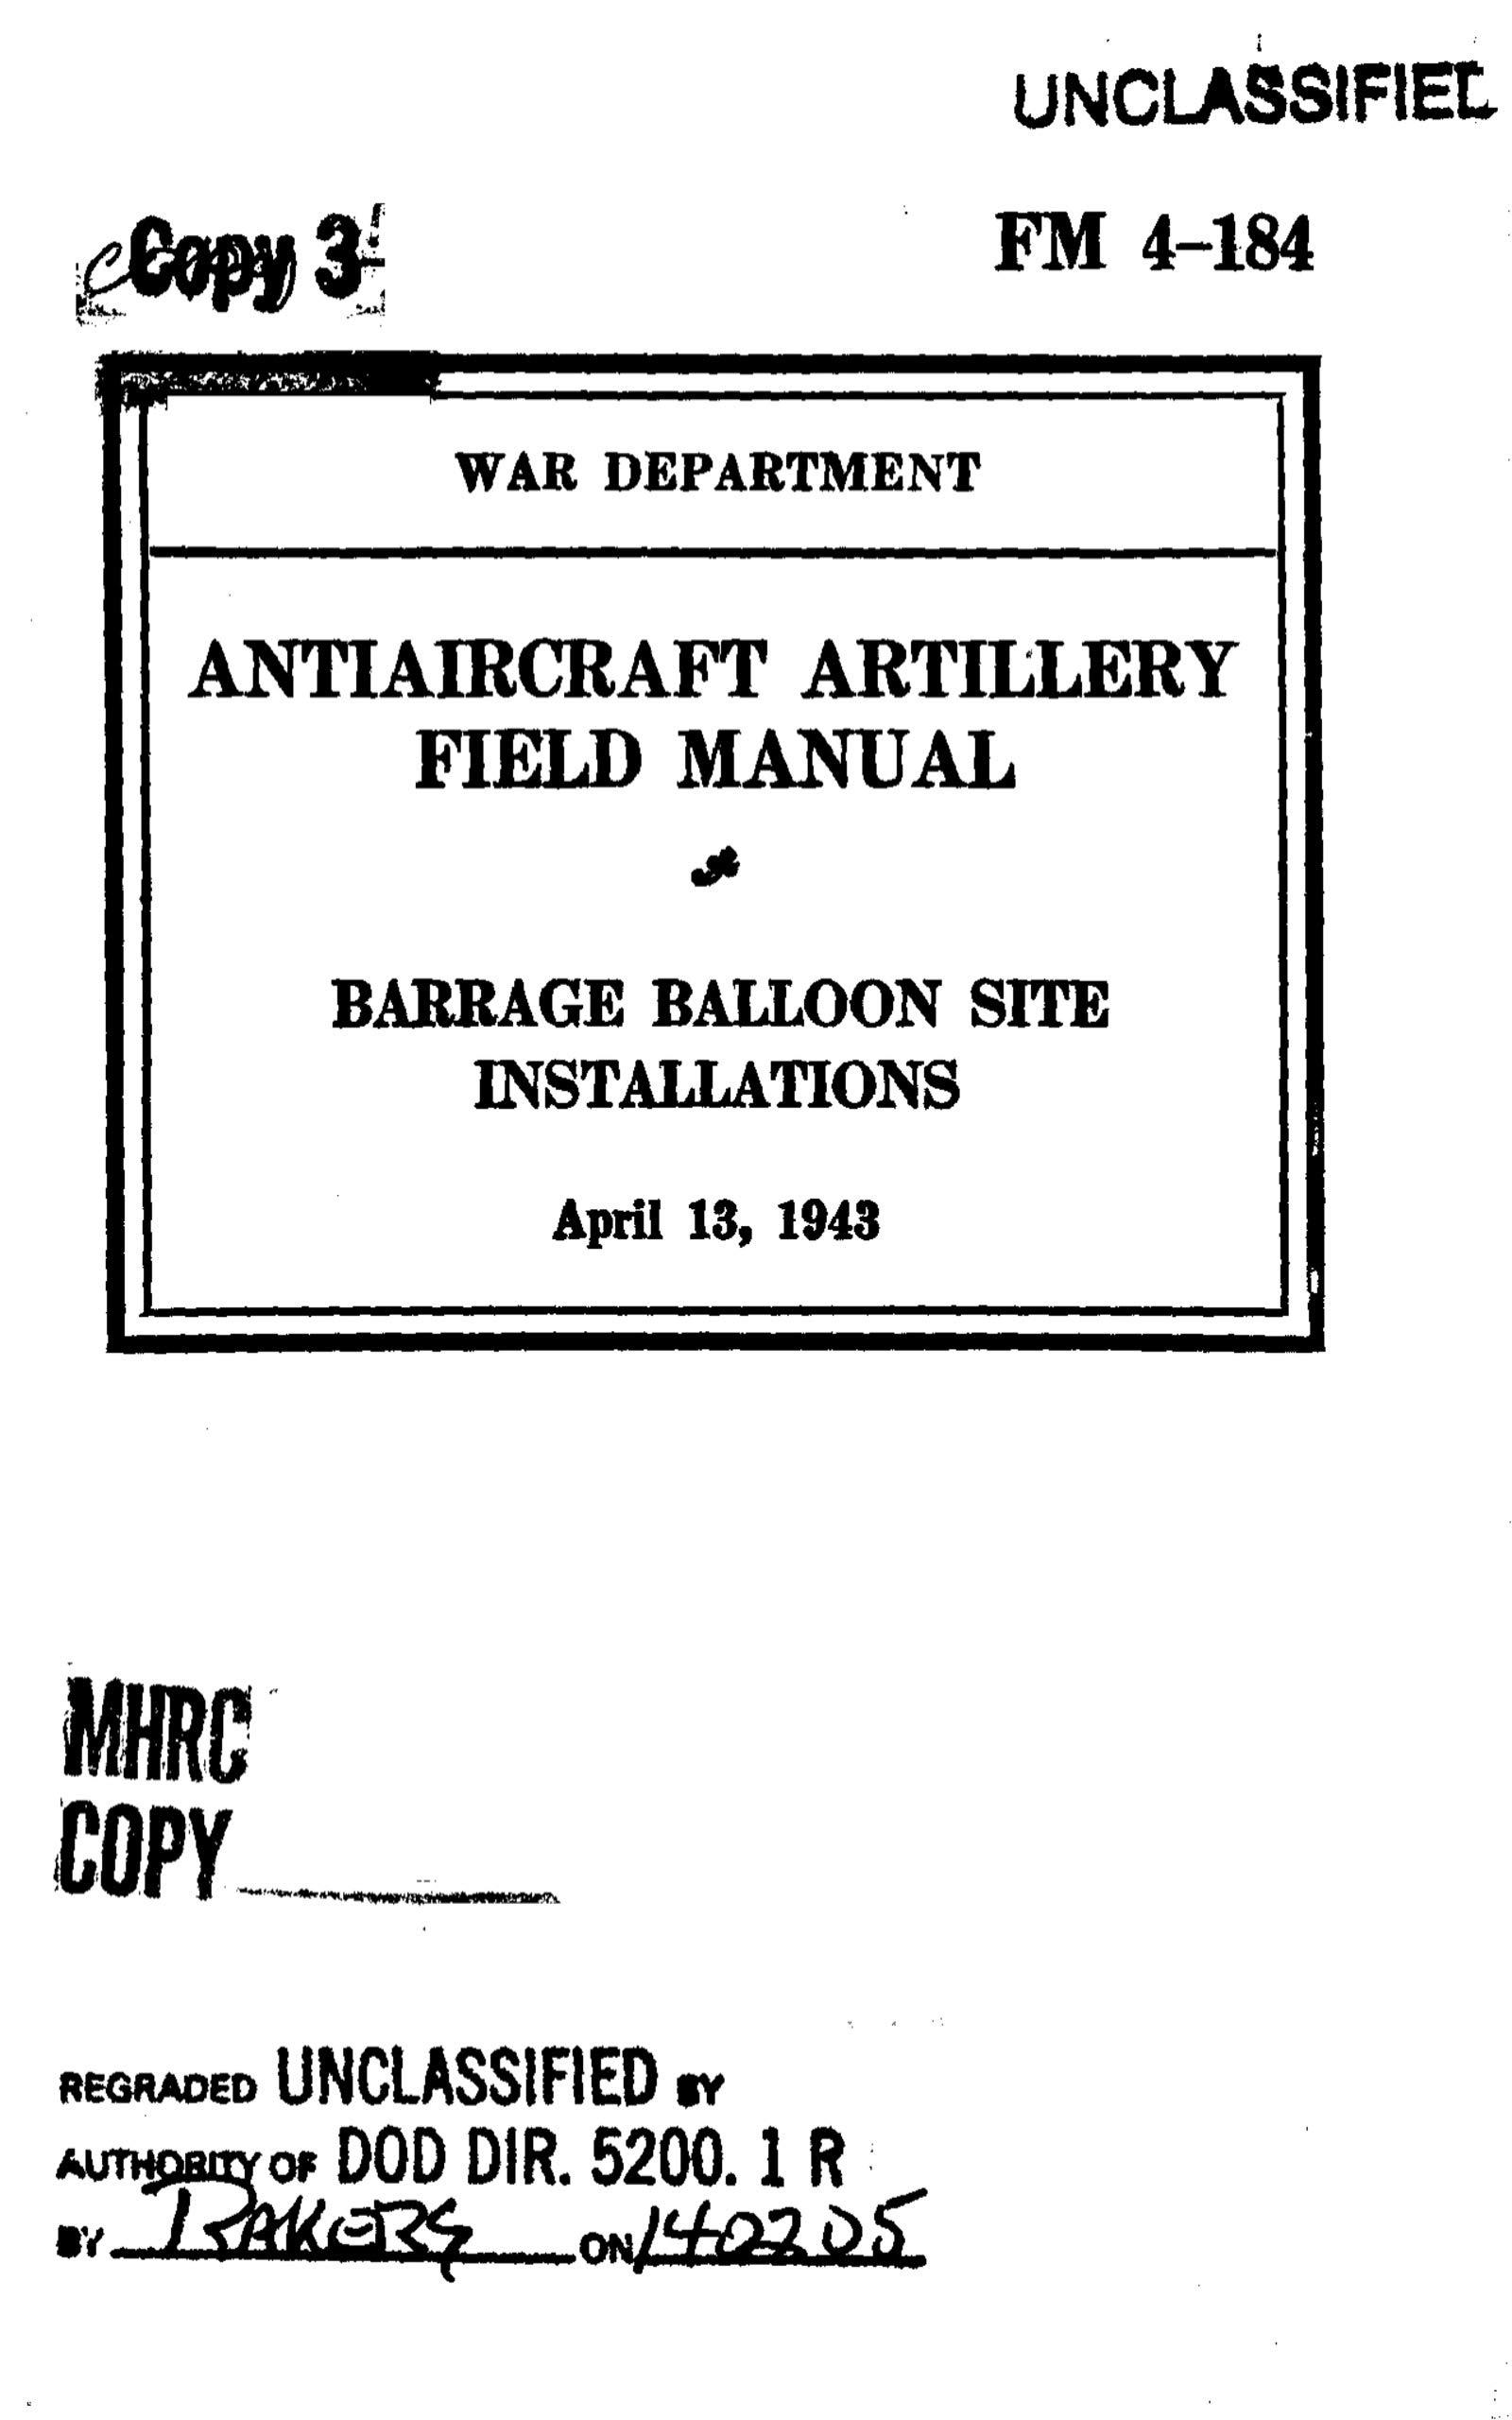 Antiaircraft Artillery Field Manual, Barrage Balloon Site Installations FM 4-184 1943 - Official U.S Army War World II Army Field Manual